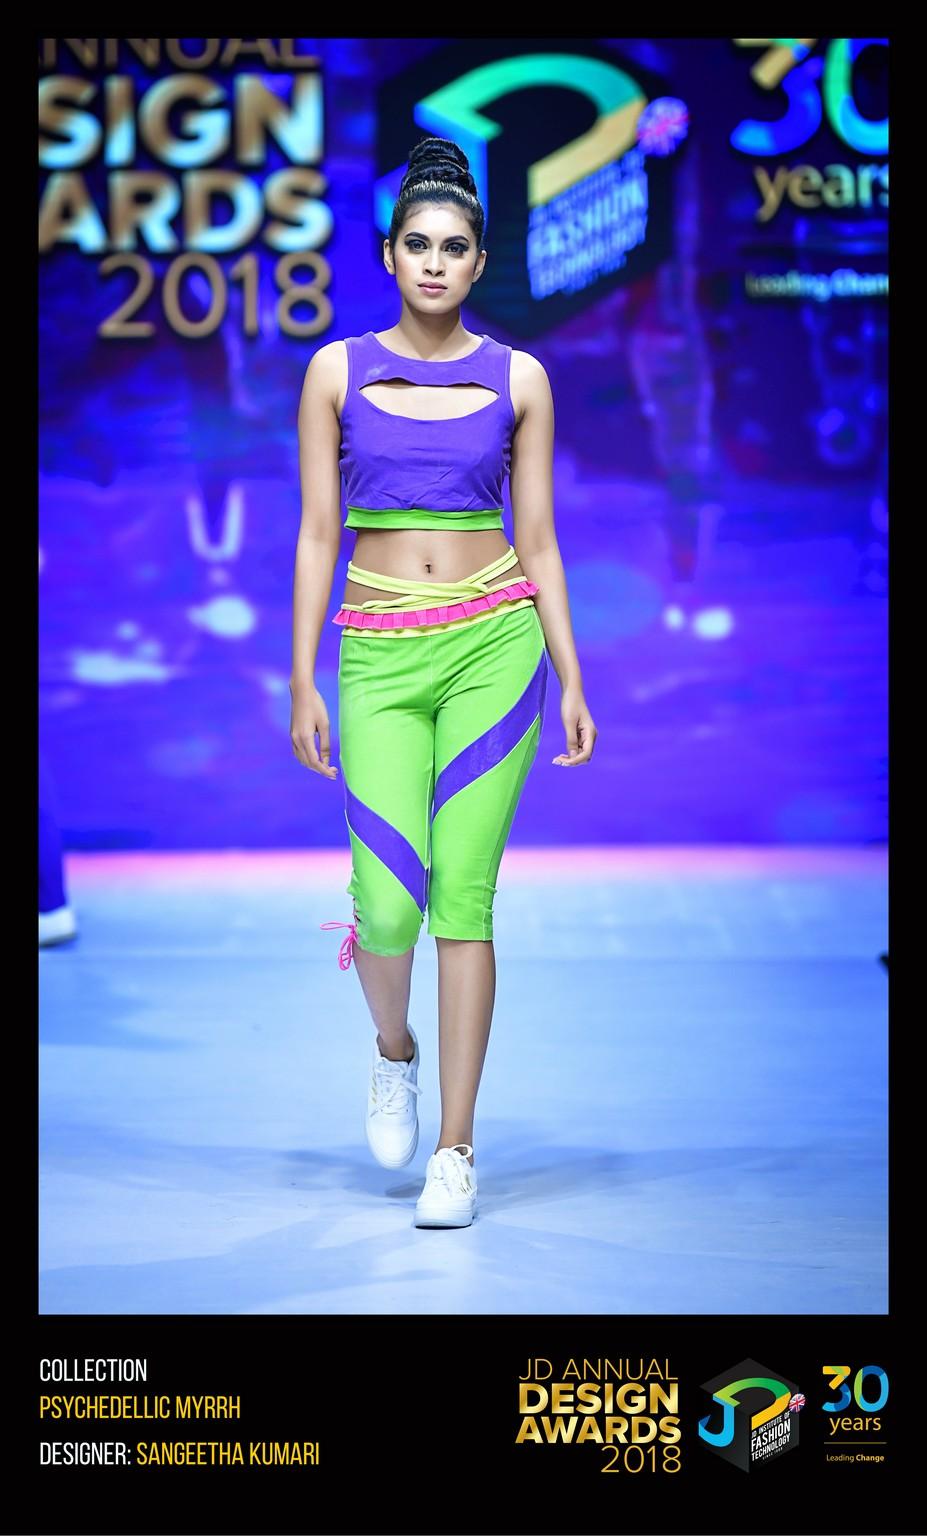 Psychedelic Myrrh – Change – JD Annual Design Awards 2018 | Designer: Sangeetha Kumari | Photography : Jerin Nath (@jerin_nath) psychedelic myrrh - PSYCHEDELLIC MYRRH2 - Psychedelic Myrrh – Change – JD Annual Design Awards 2018